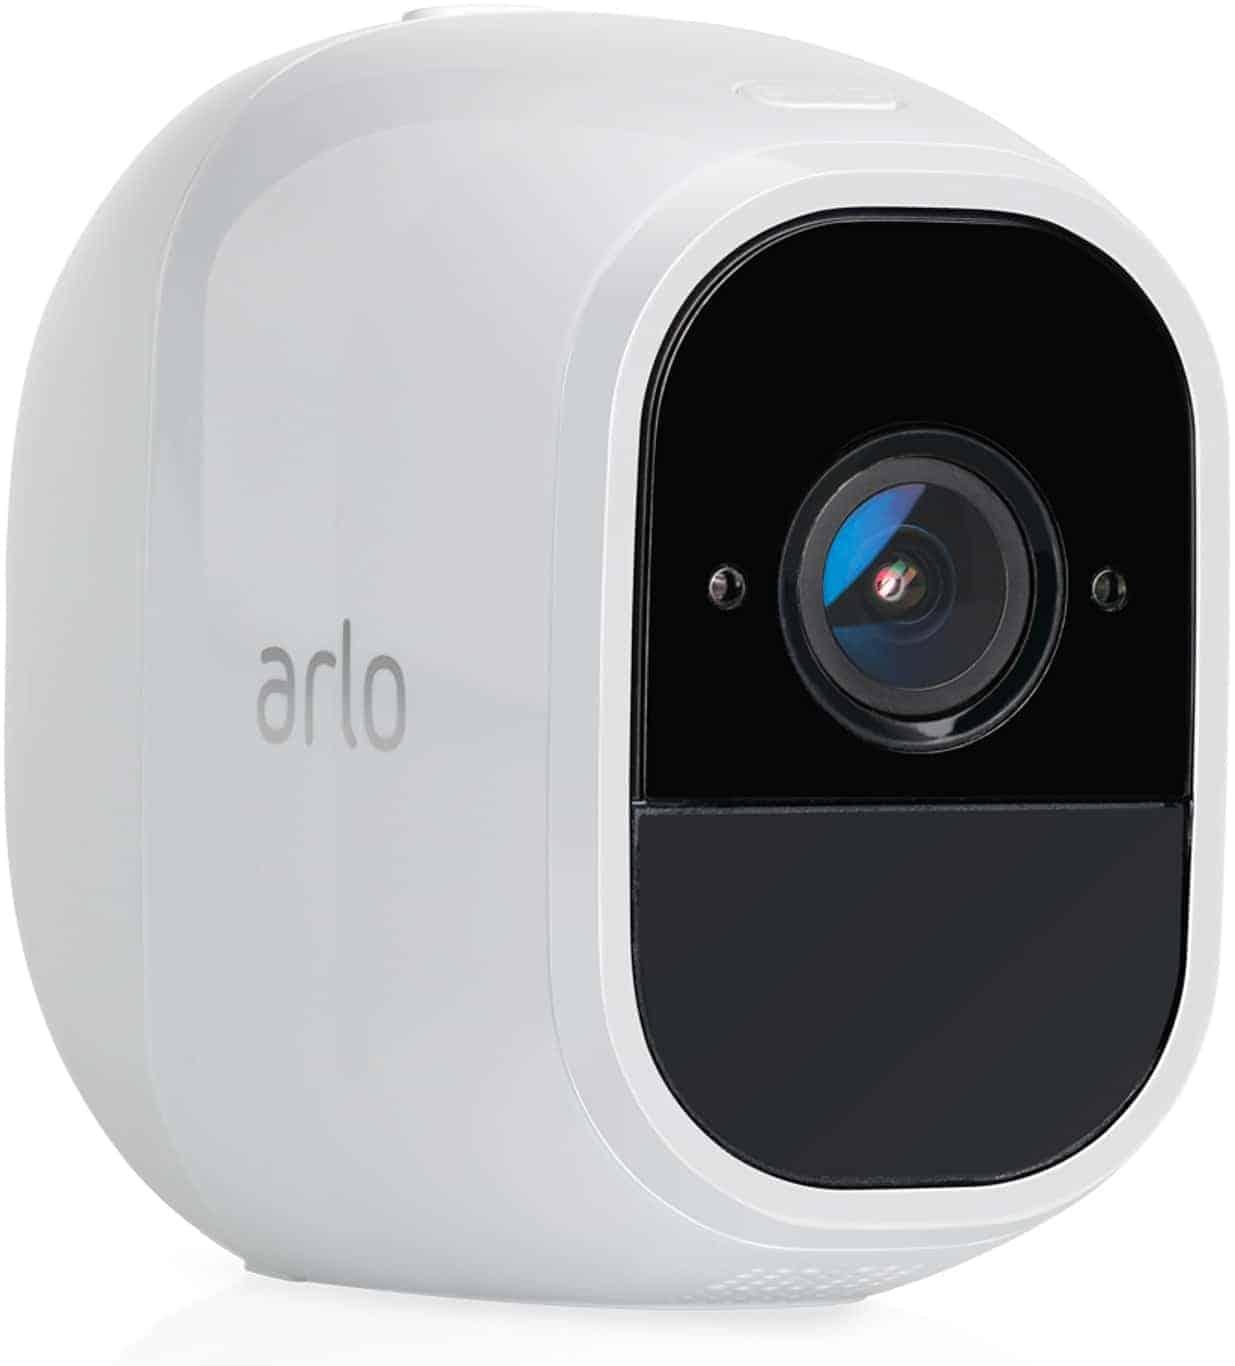 Netgear Arlo Pro 2 AM AH 2